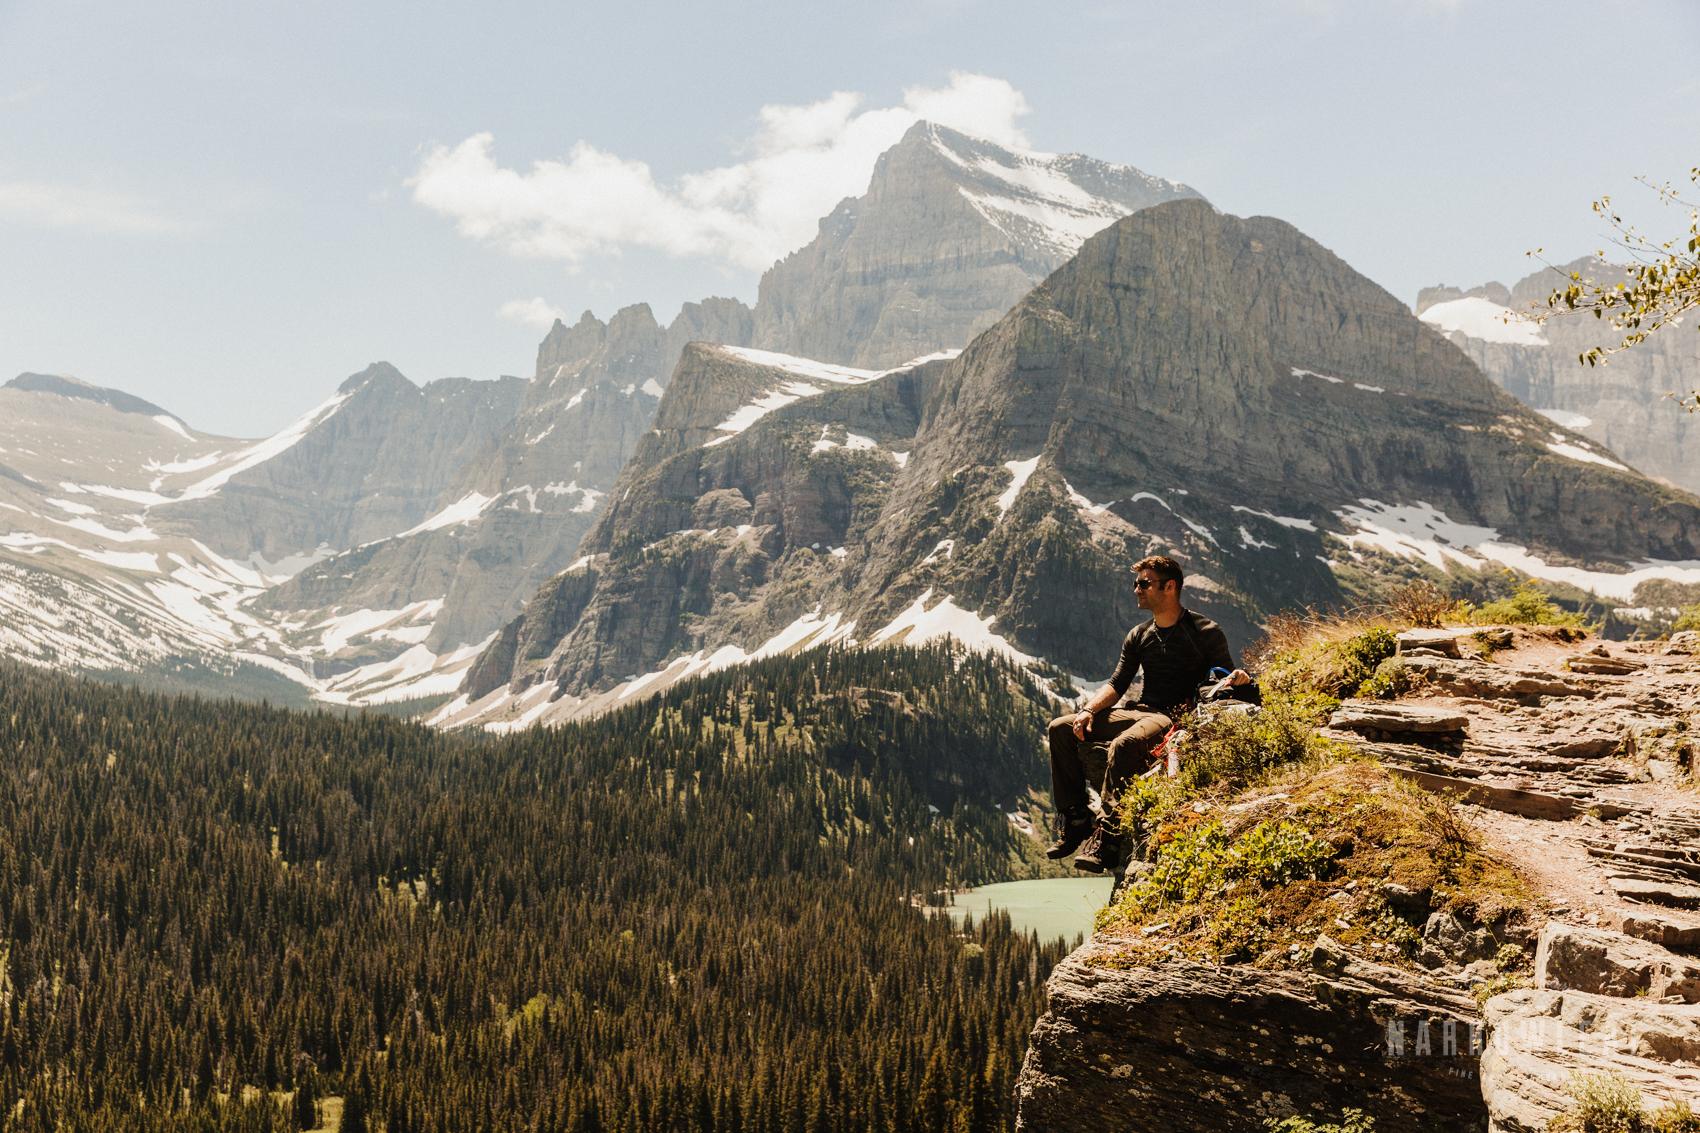 Montana-Glacier-National-Park-Many-Glacier-Narrowleaf-Love-and-Adventure-elopement-Photography-9549.jpg